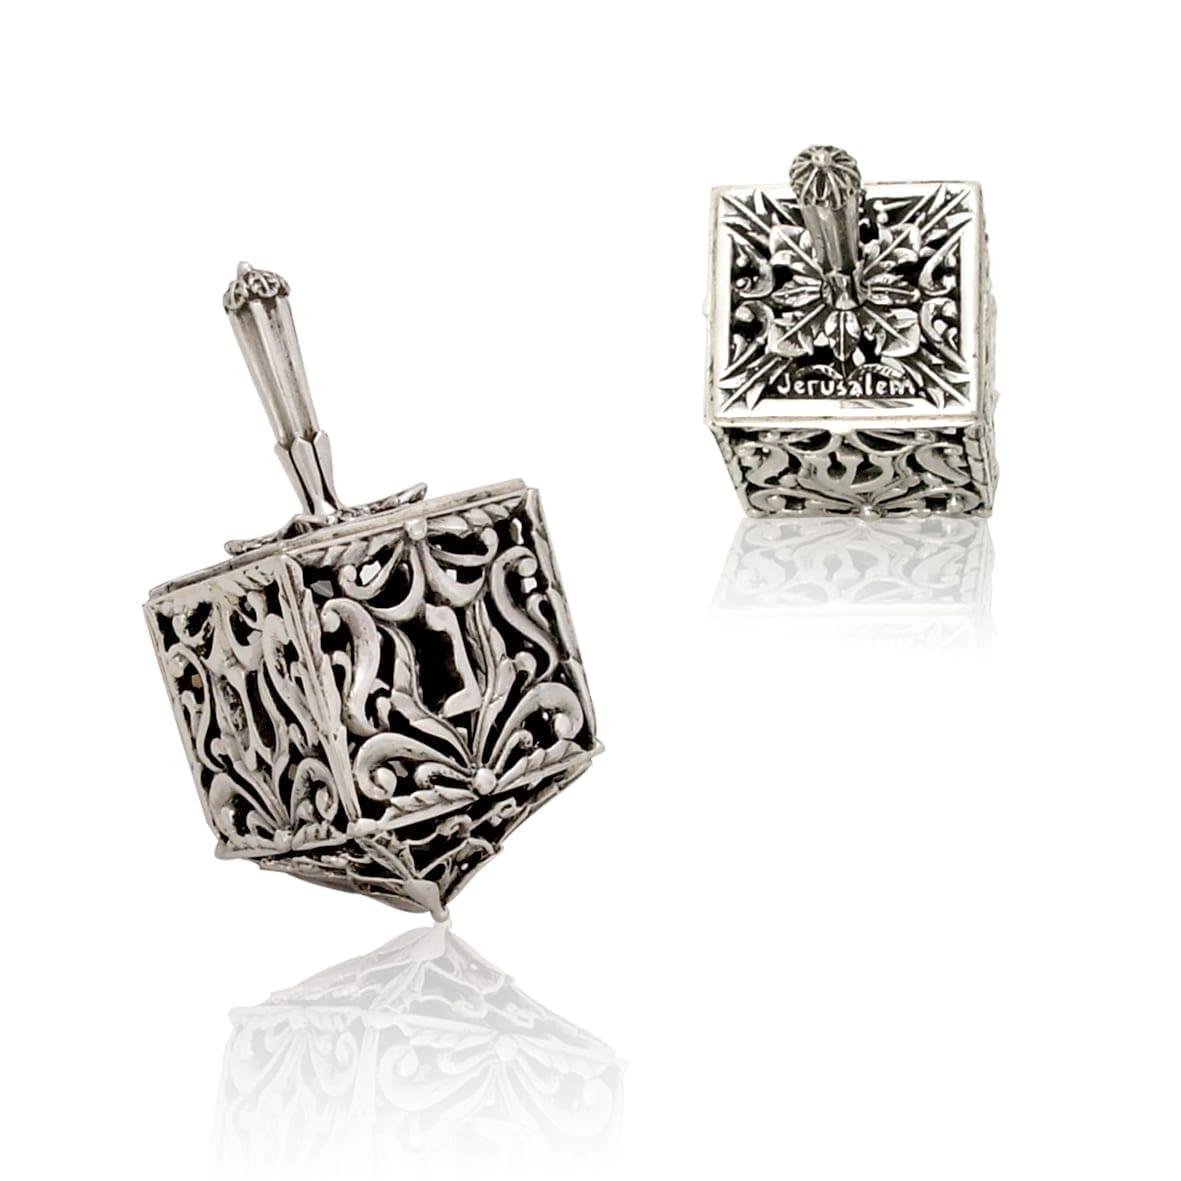 Rich sterling silver dreidel, Hannukah Judaica gifts made in Israel